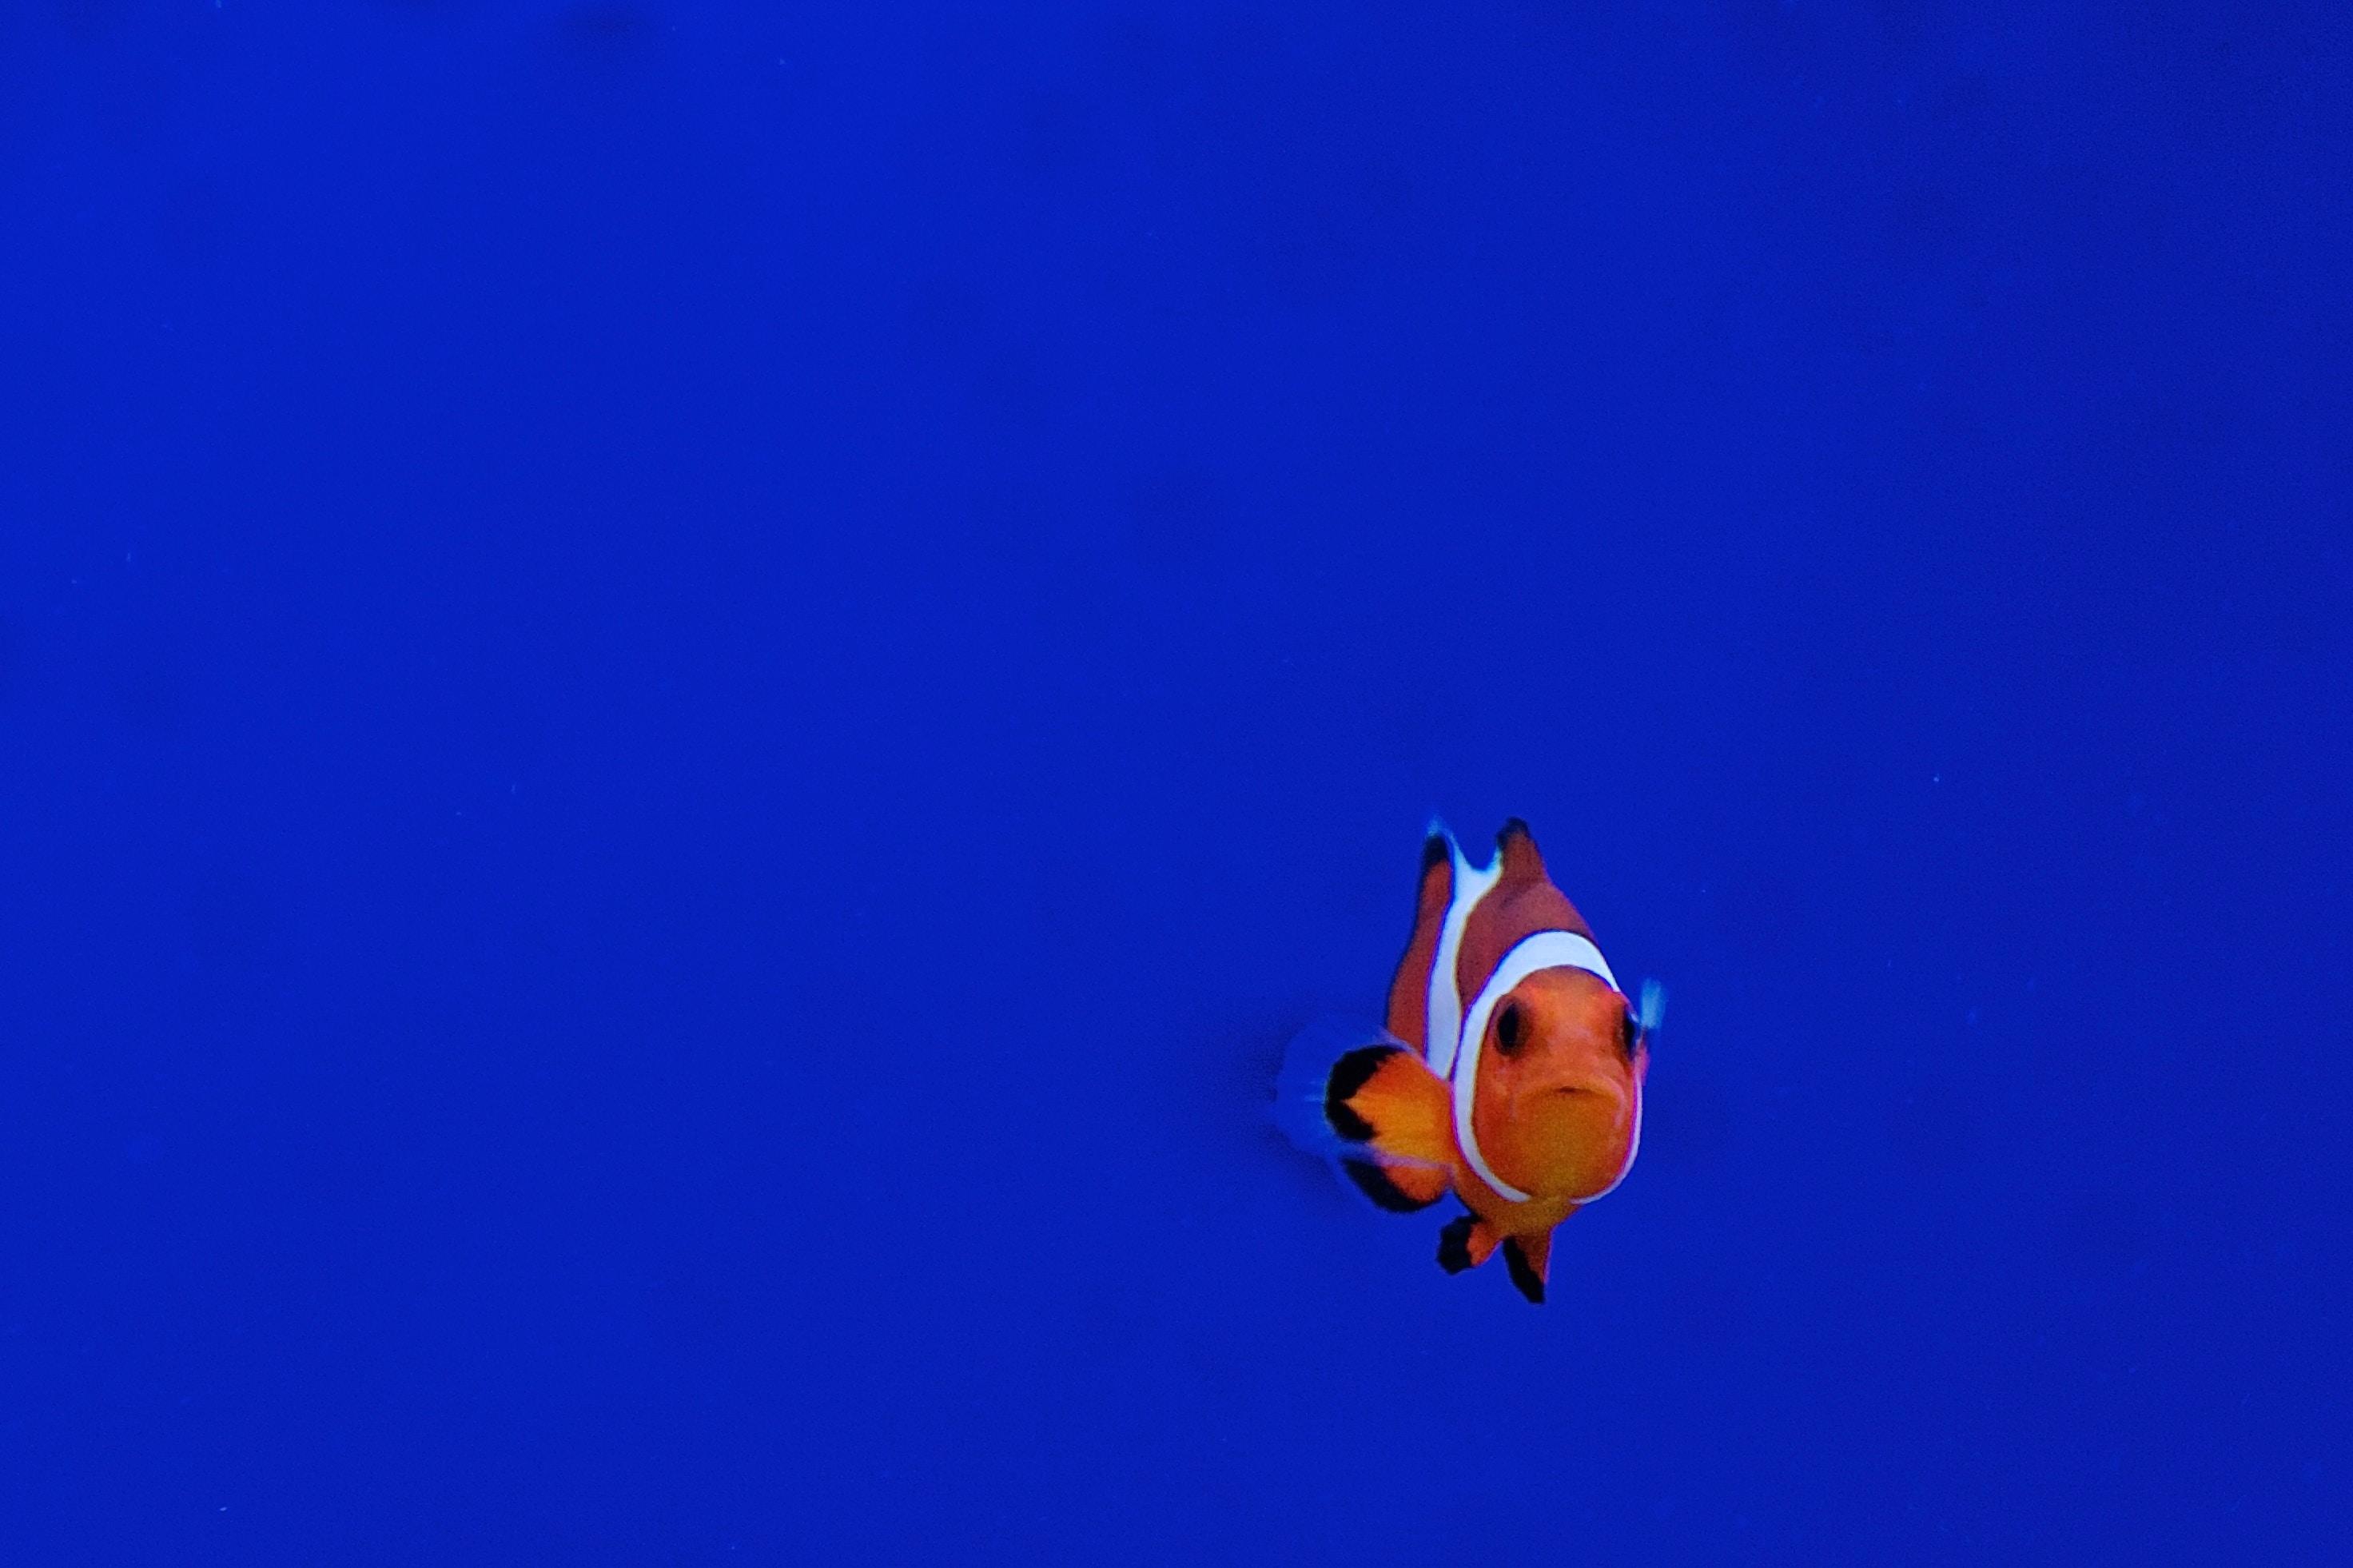 clown fish swimming in water